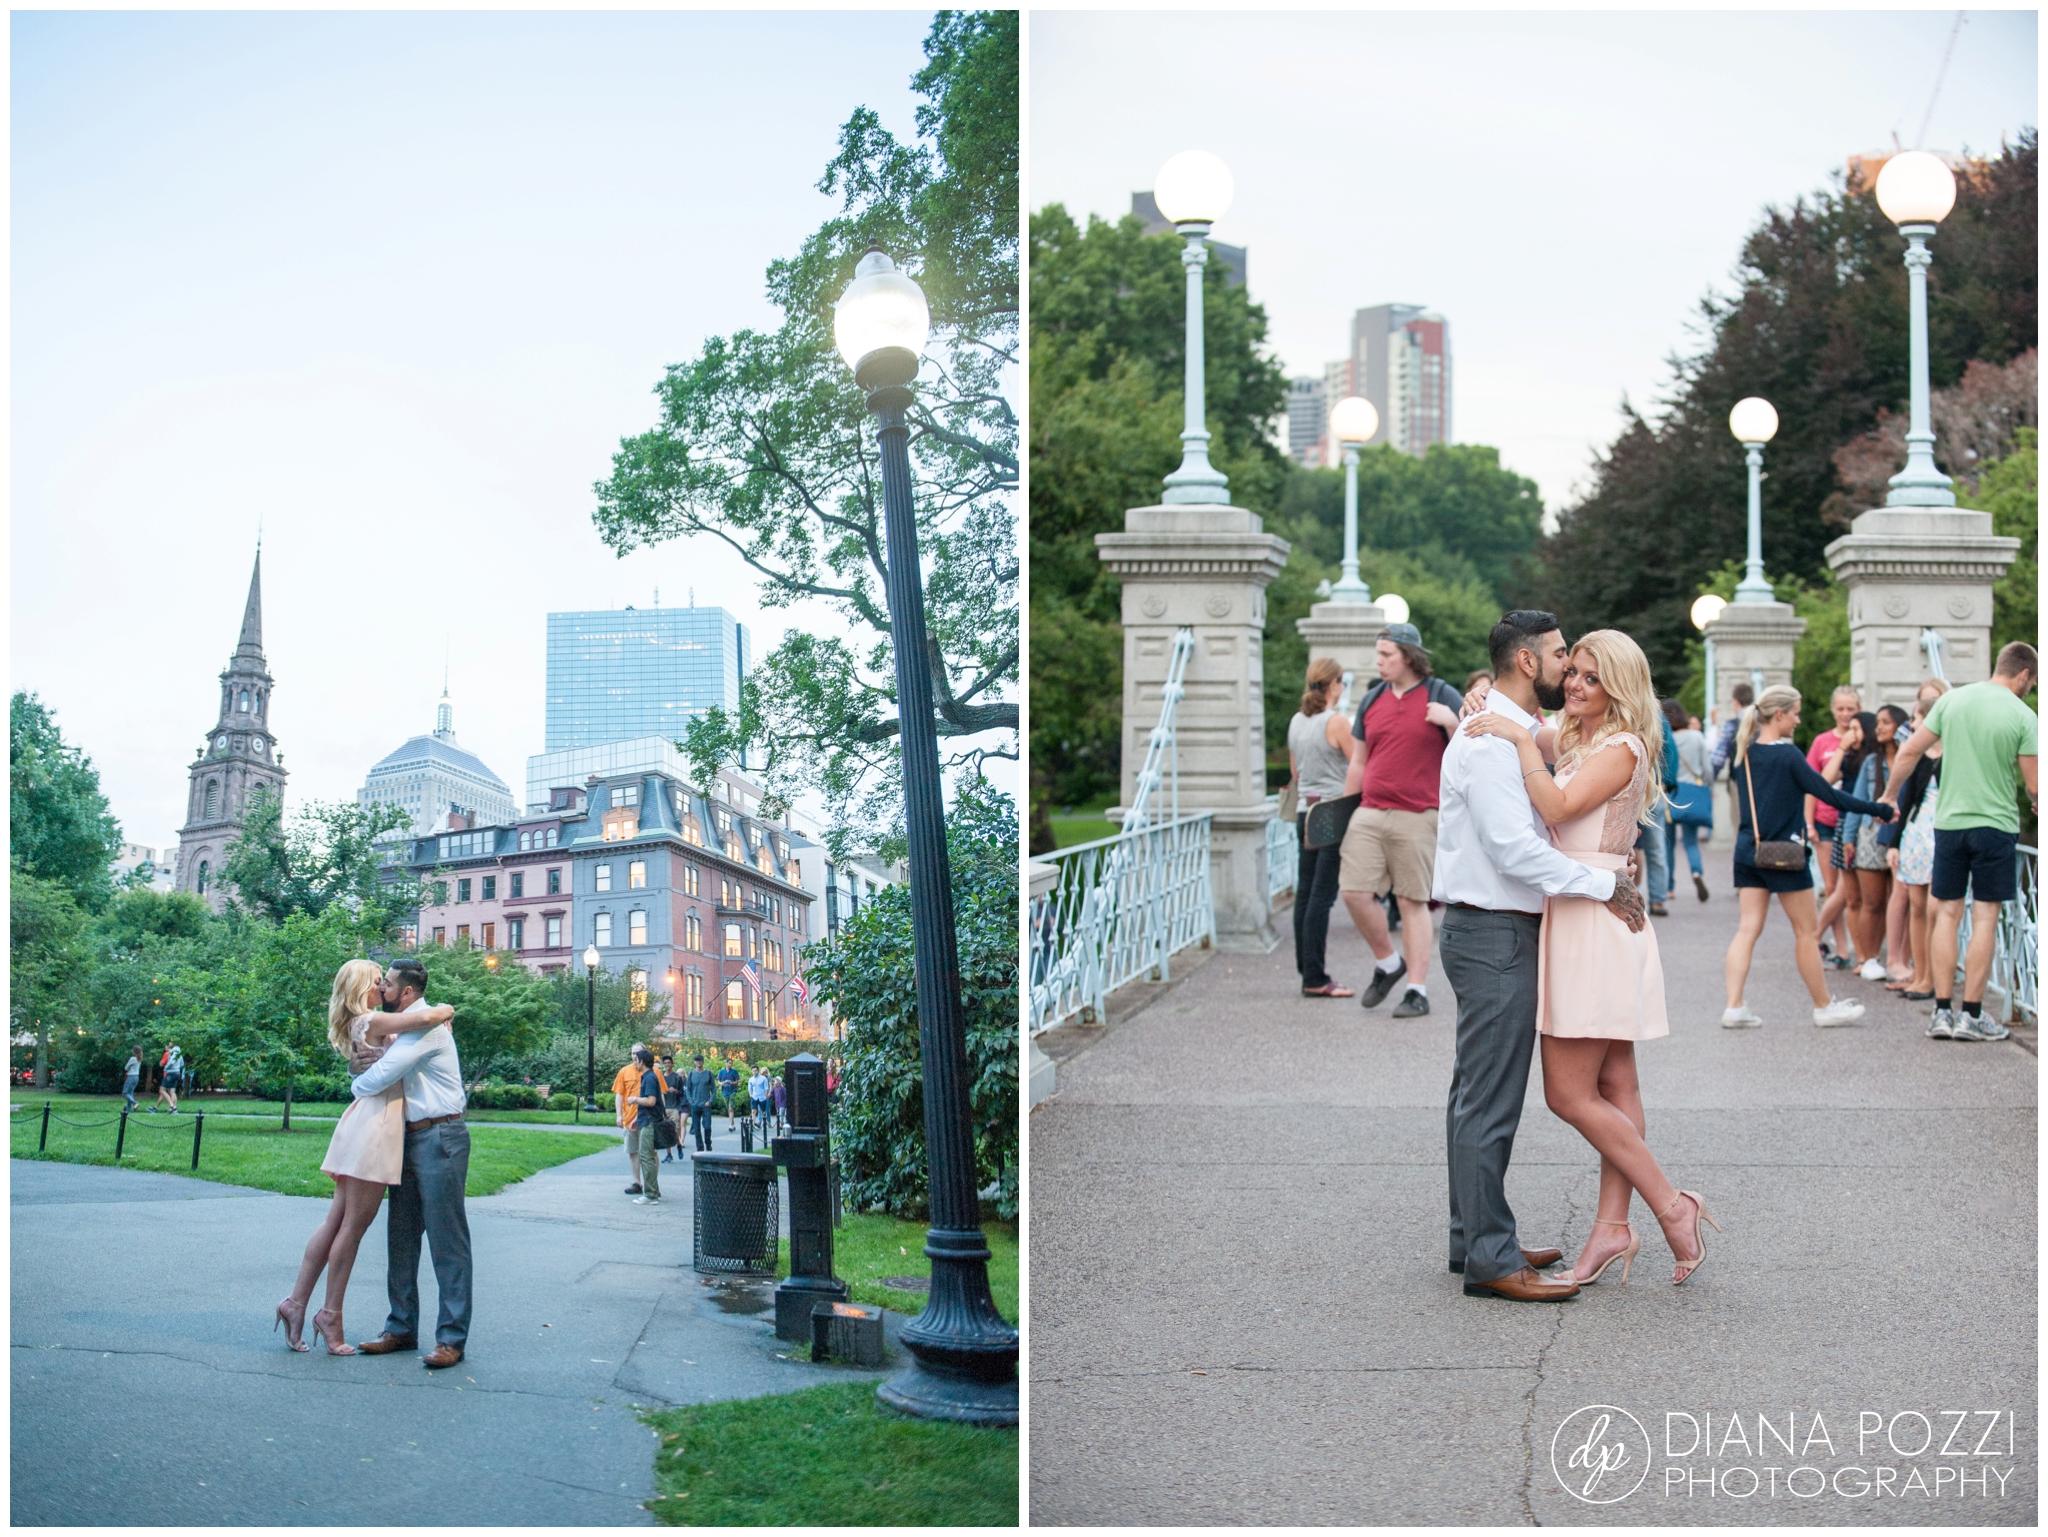 Fenway Park Engagement Session Diana Pozzi Photography